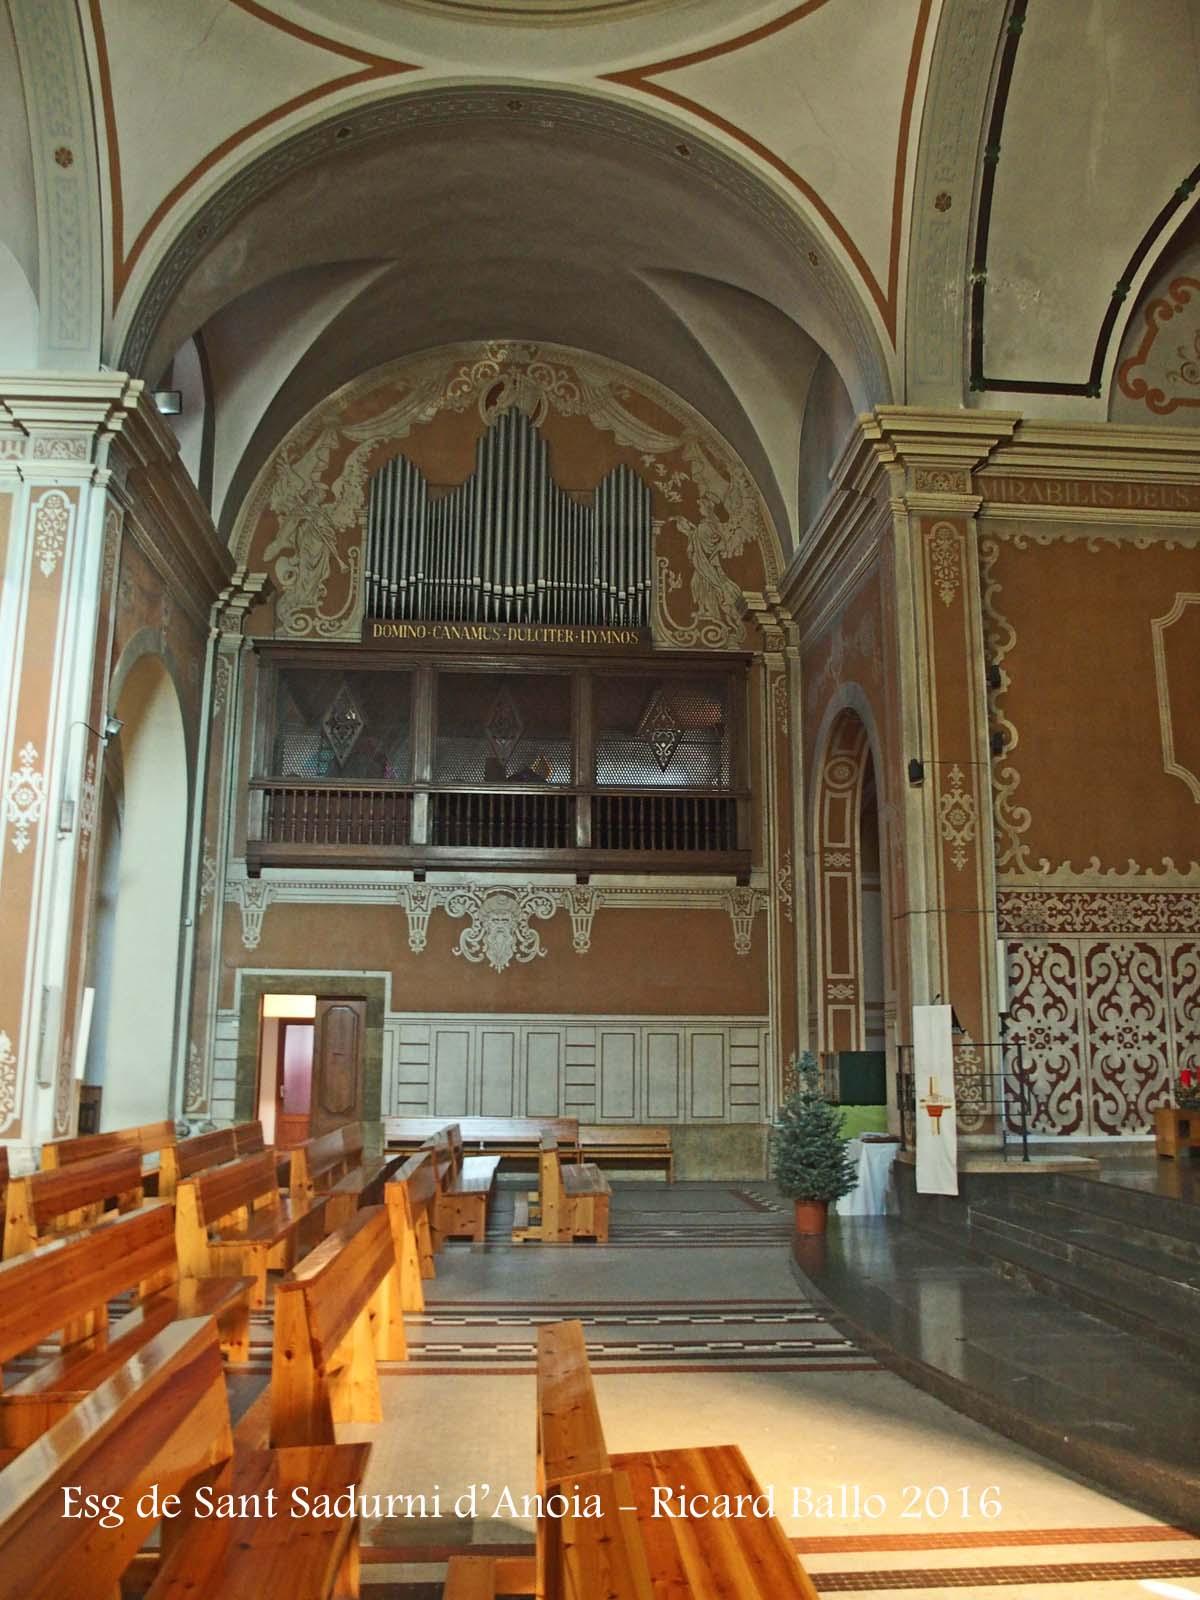 Esgl sia parroquial de sant sadurn sant sadurn d anoia alt pened s catalunya medieval - Muebles sant sadurni d anoia ...